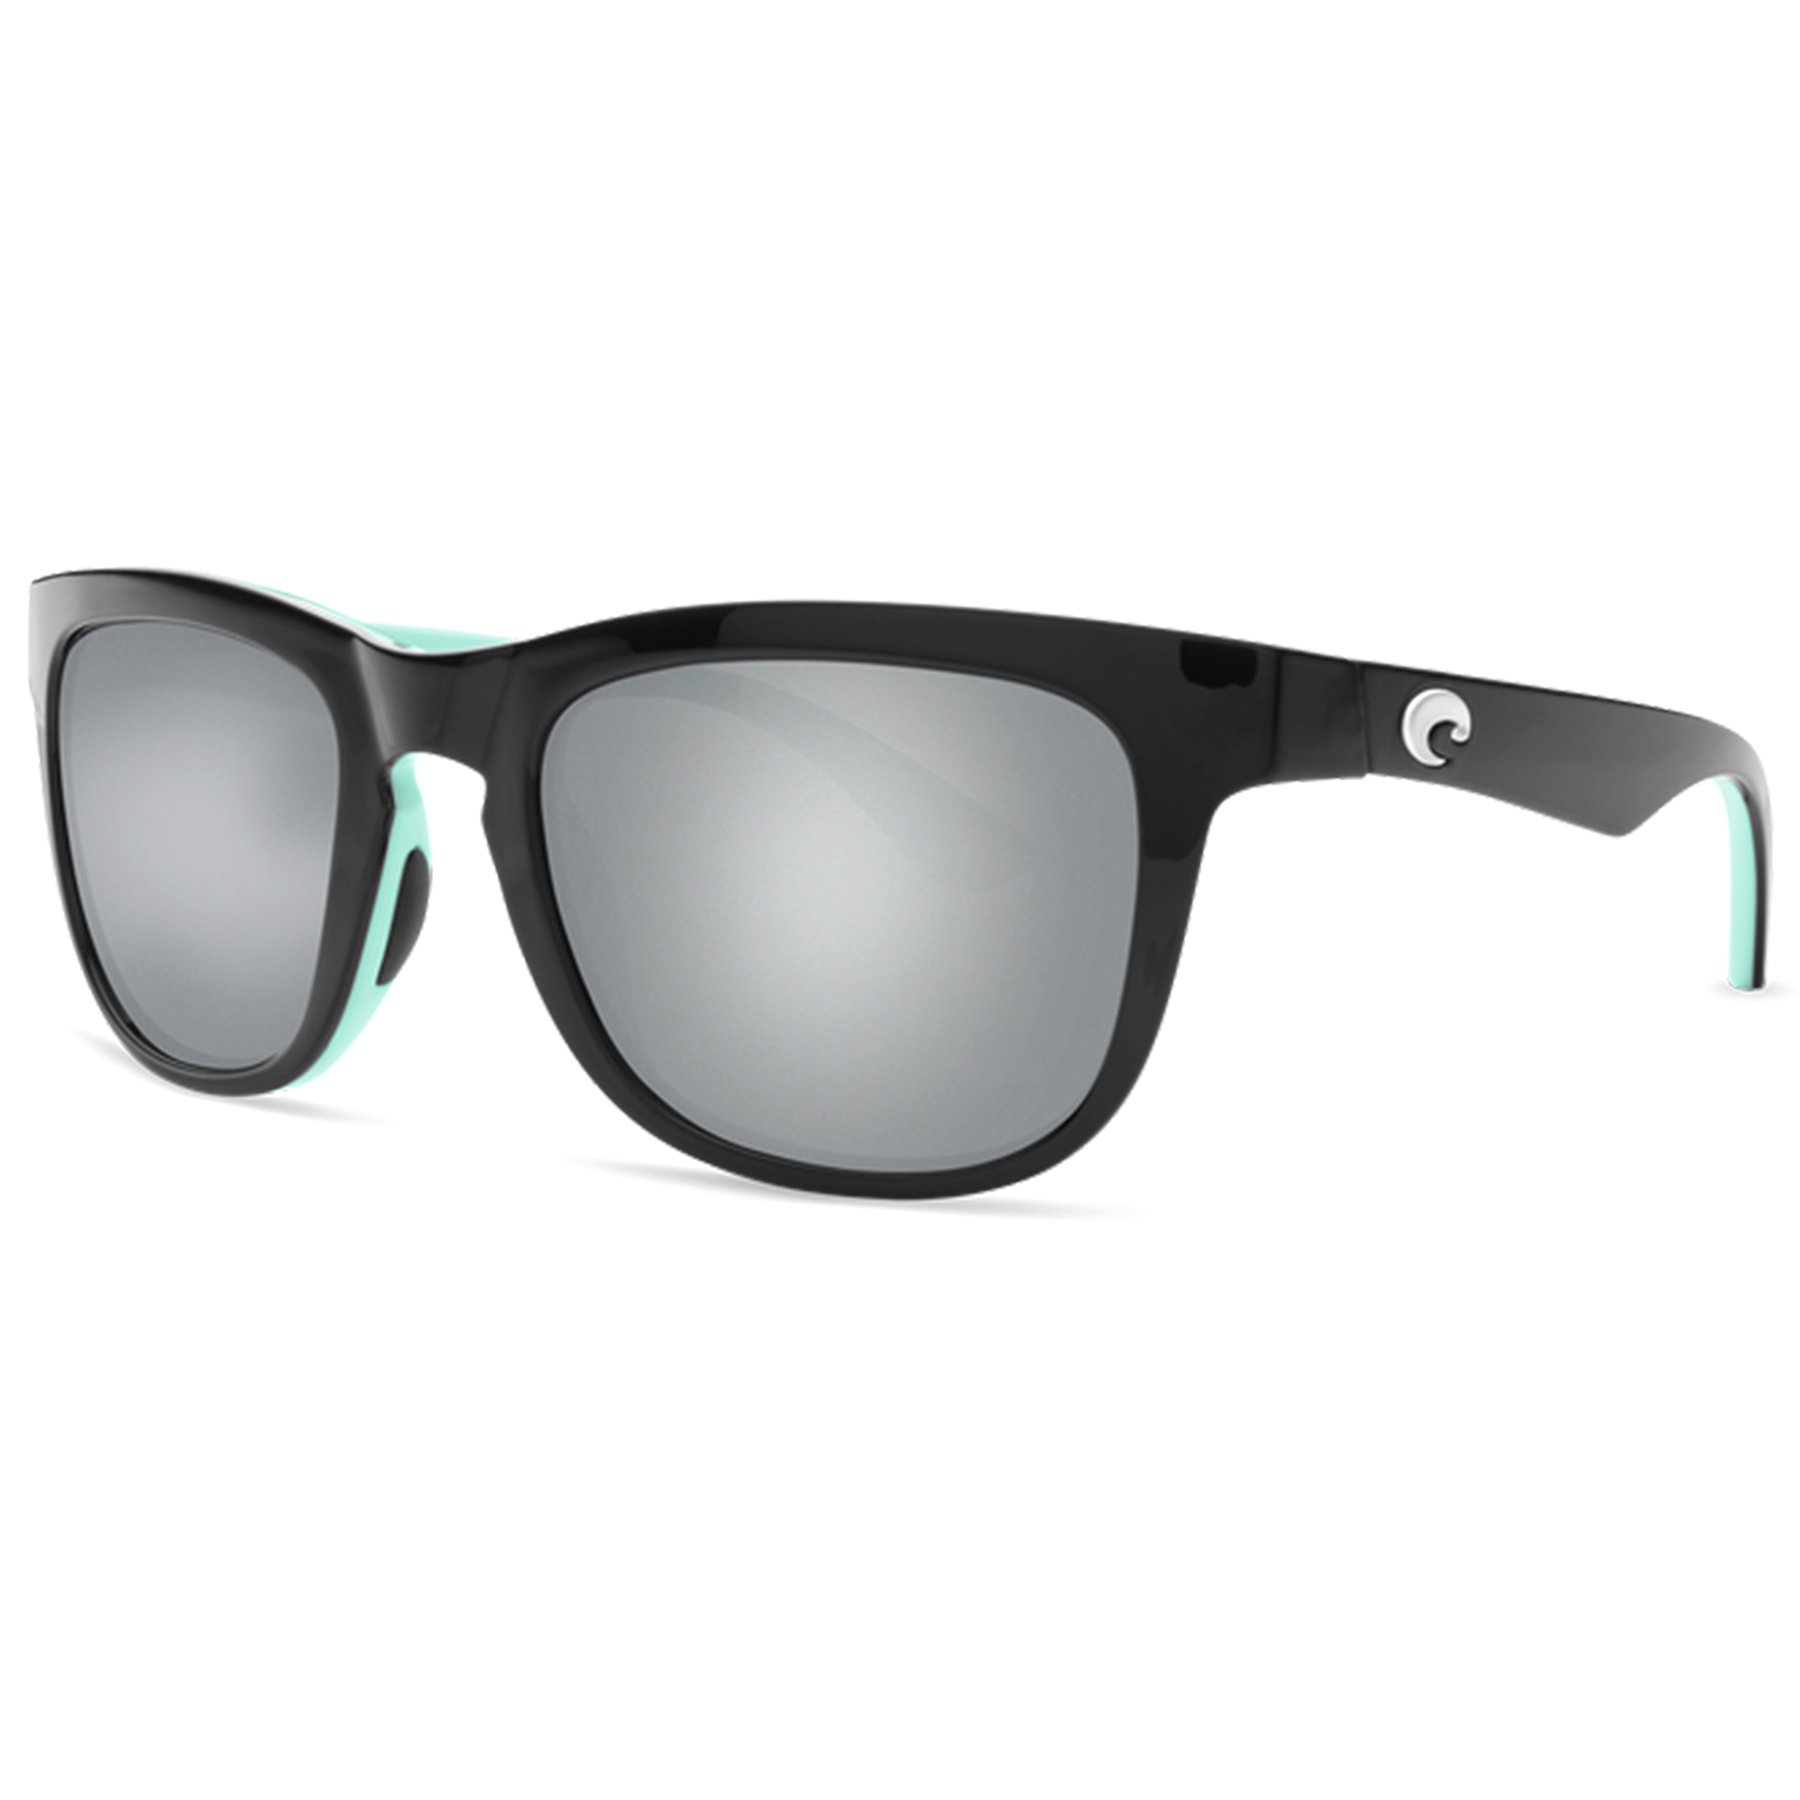 Costa Del Mar Copra Sunglasses Shiny Black/Mint / Gray 580Plastic